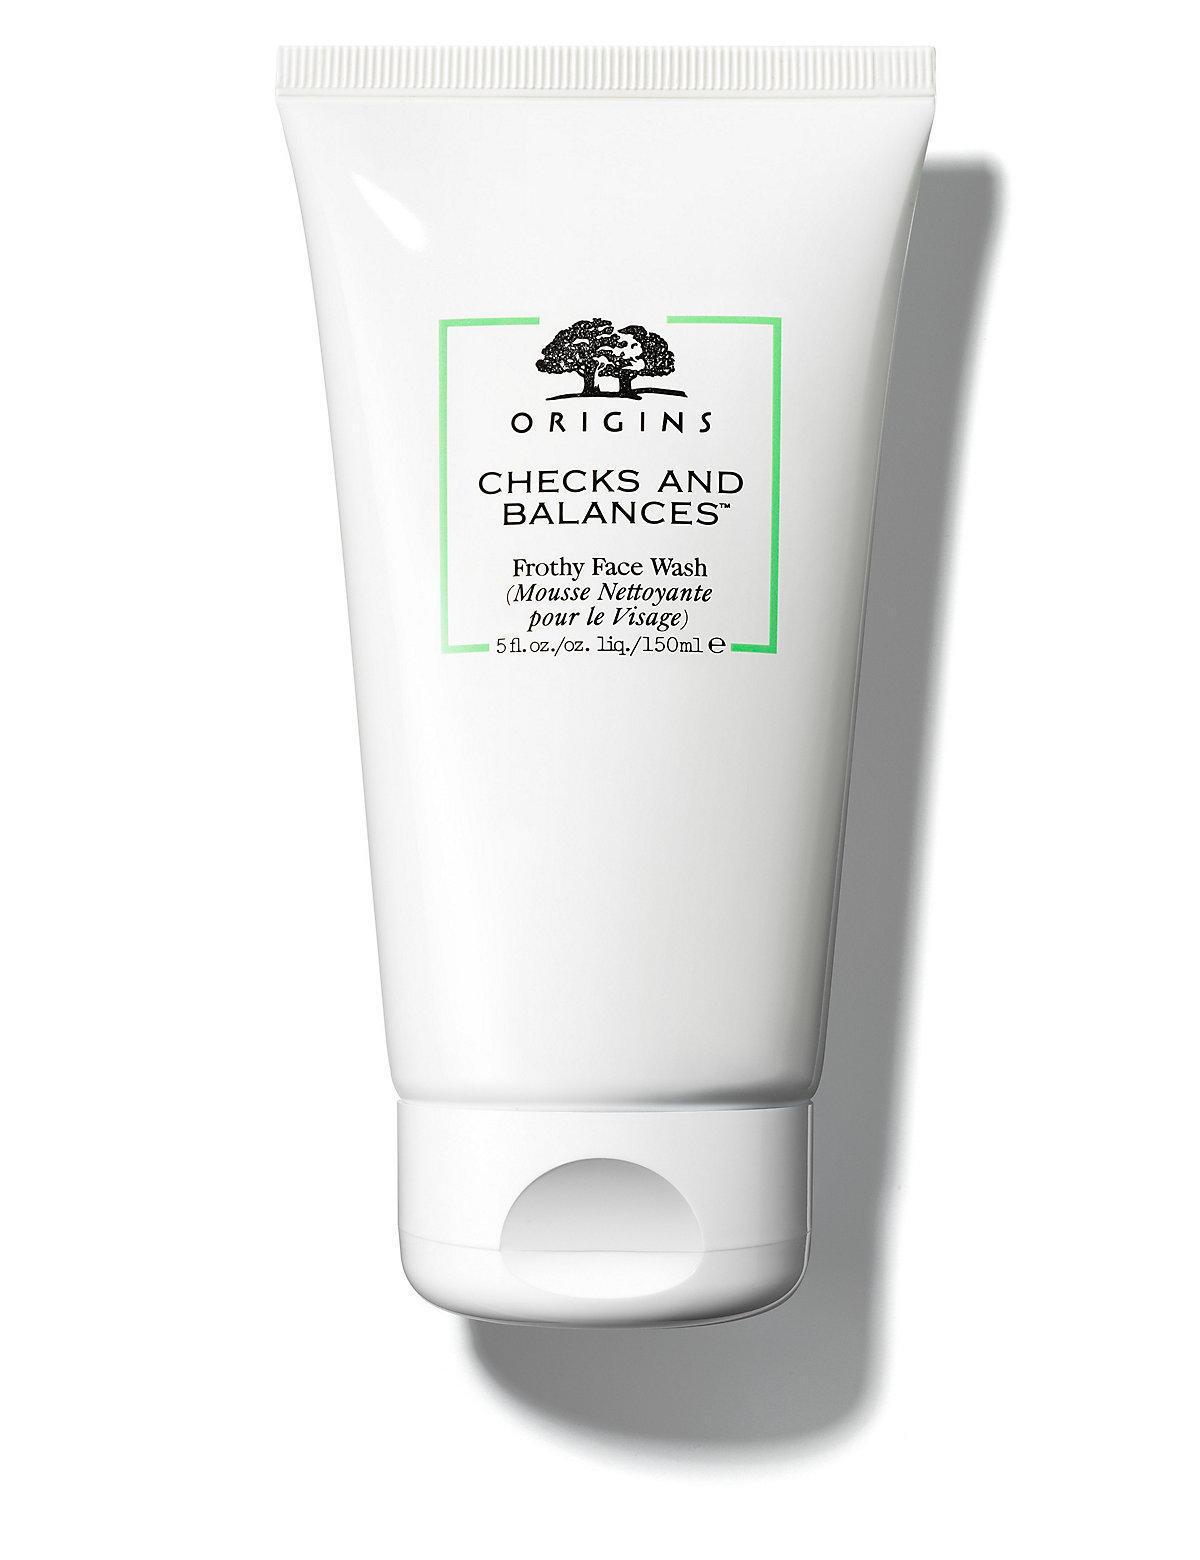 Origins Checks & Balances Frothy Face Wash 150ml